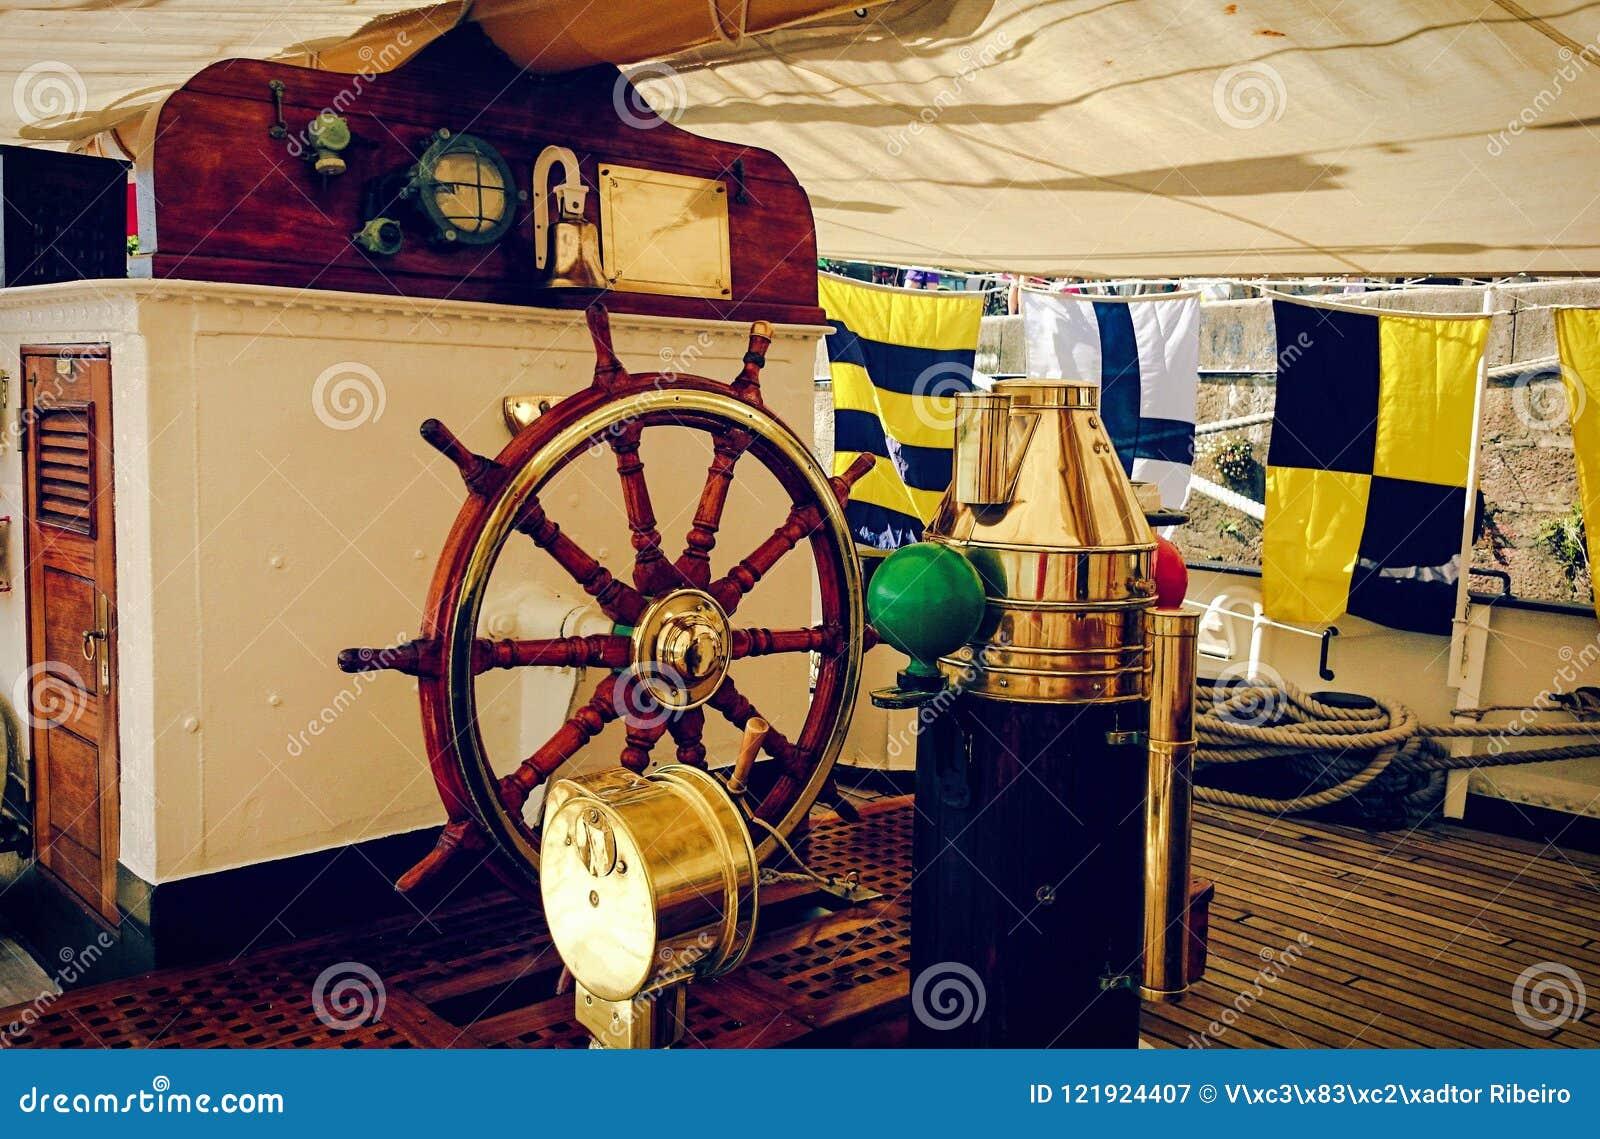 Inside sailboat in Oporto